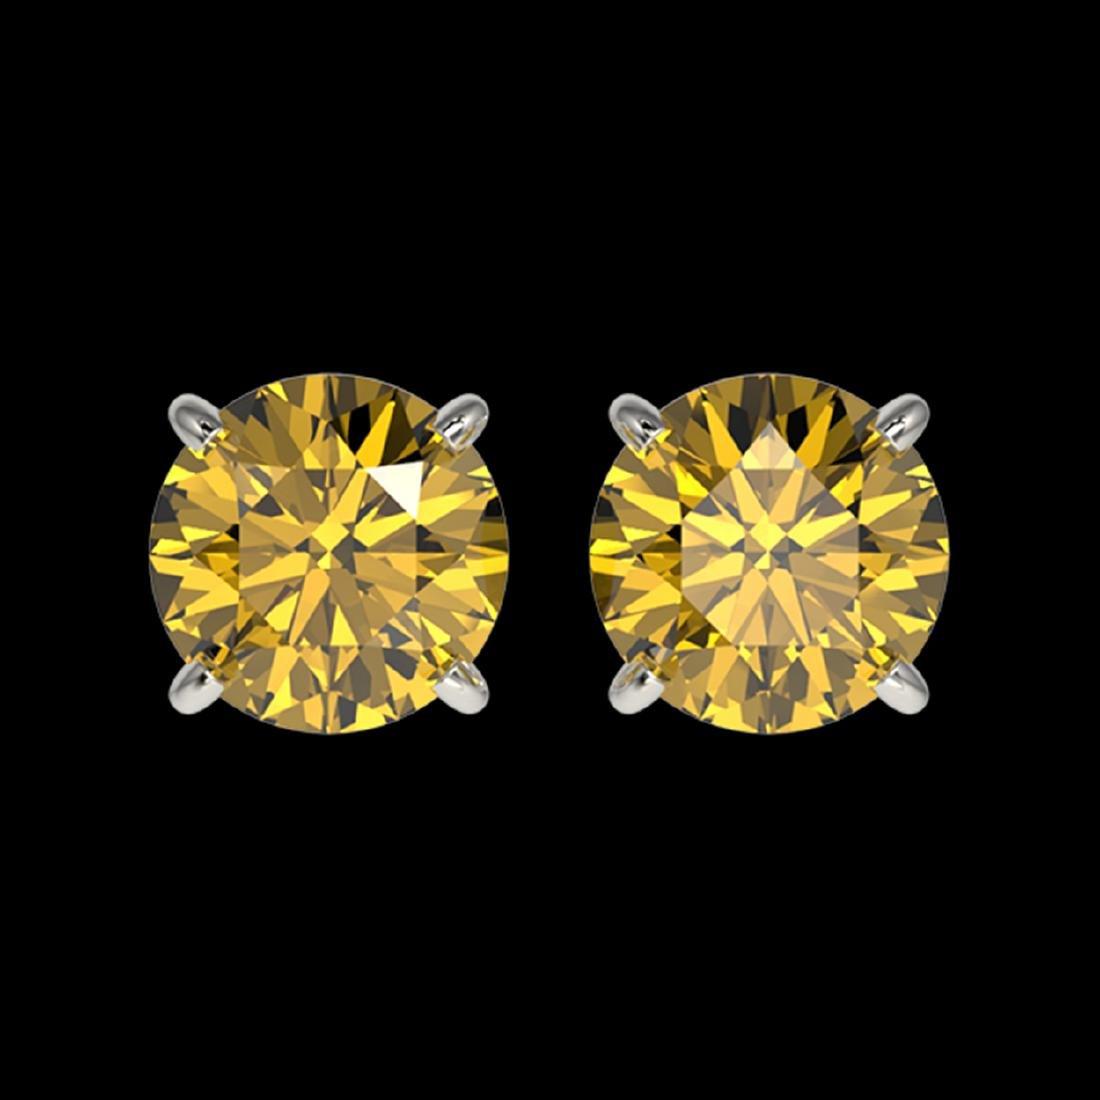 1.54 ctw Intense Yellow Diamond Stud Earrings 10K White